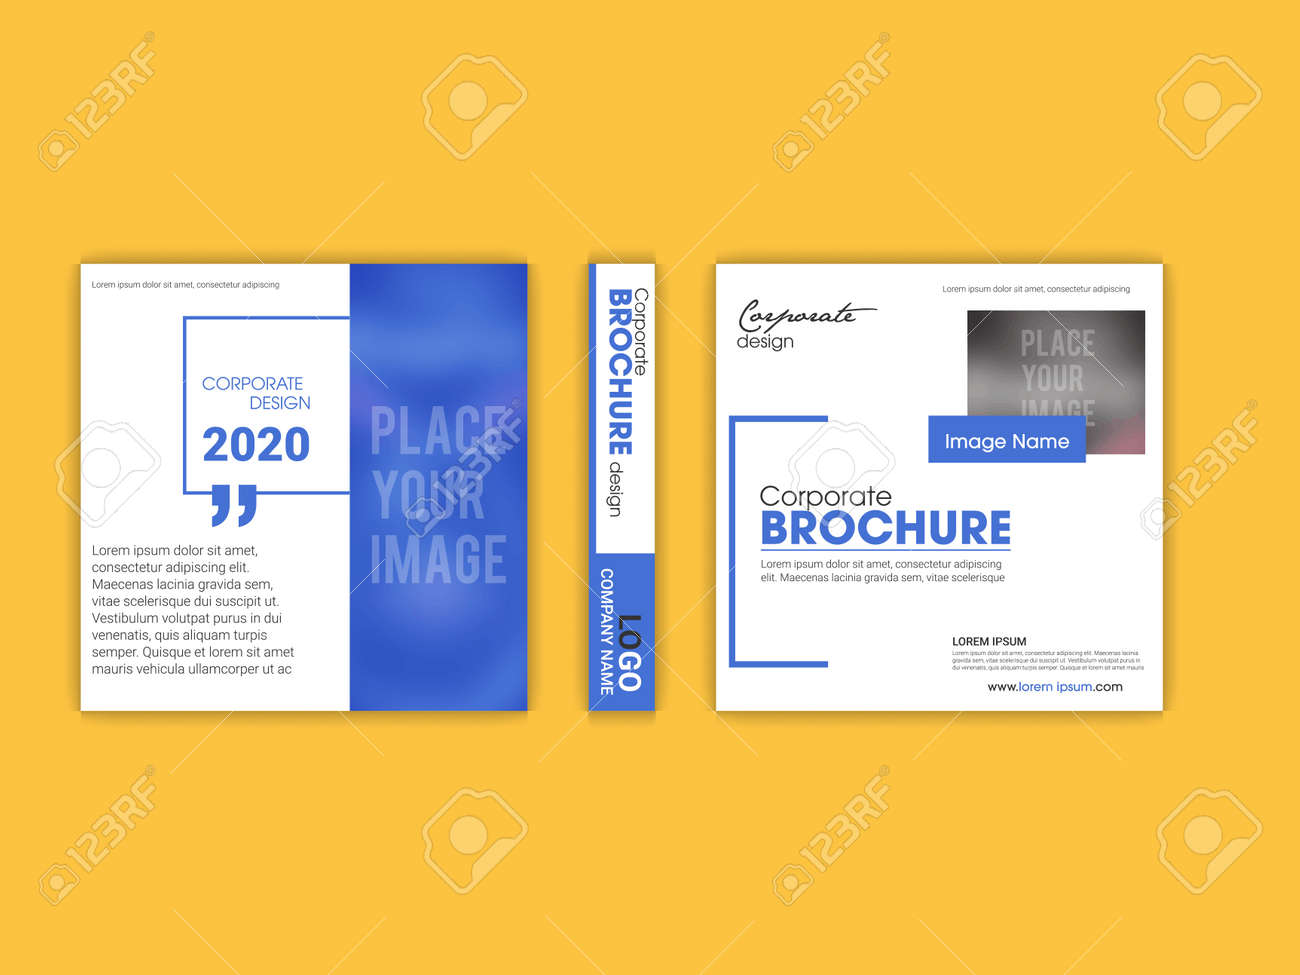 Template vector design for Brochure, Annual Report, Magazine, Poster, Corporate Presentation, Portfolio, Flyer, infographic, layout modern - 168074138